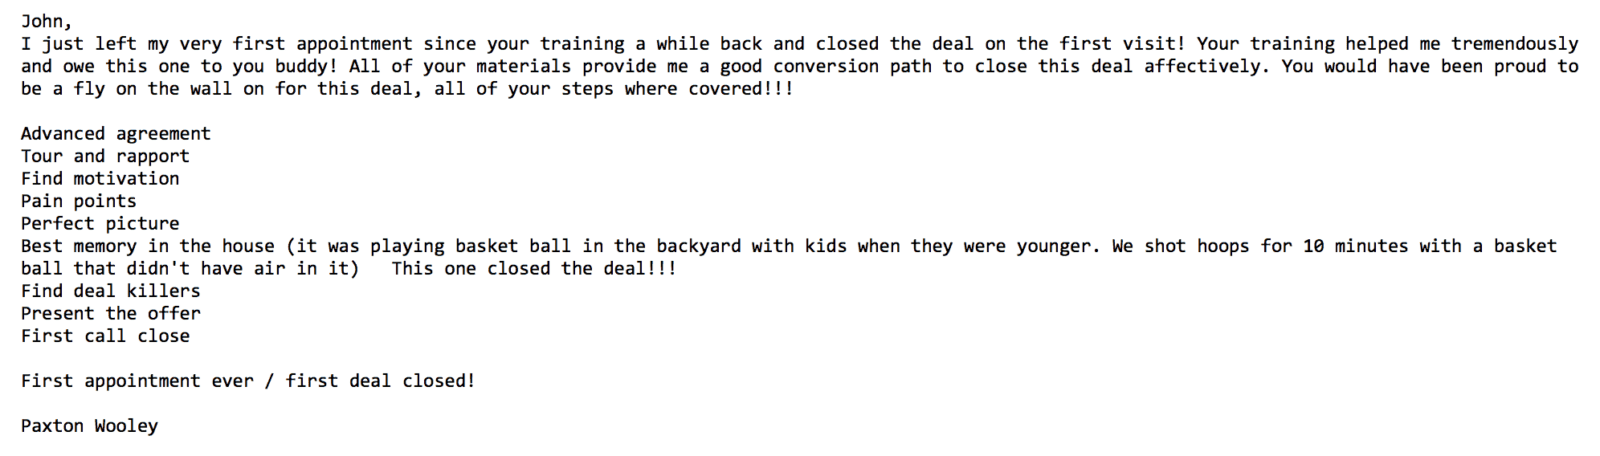 Paxton Email Testimonial